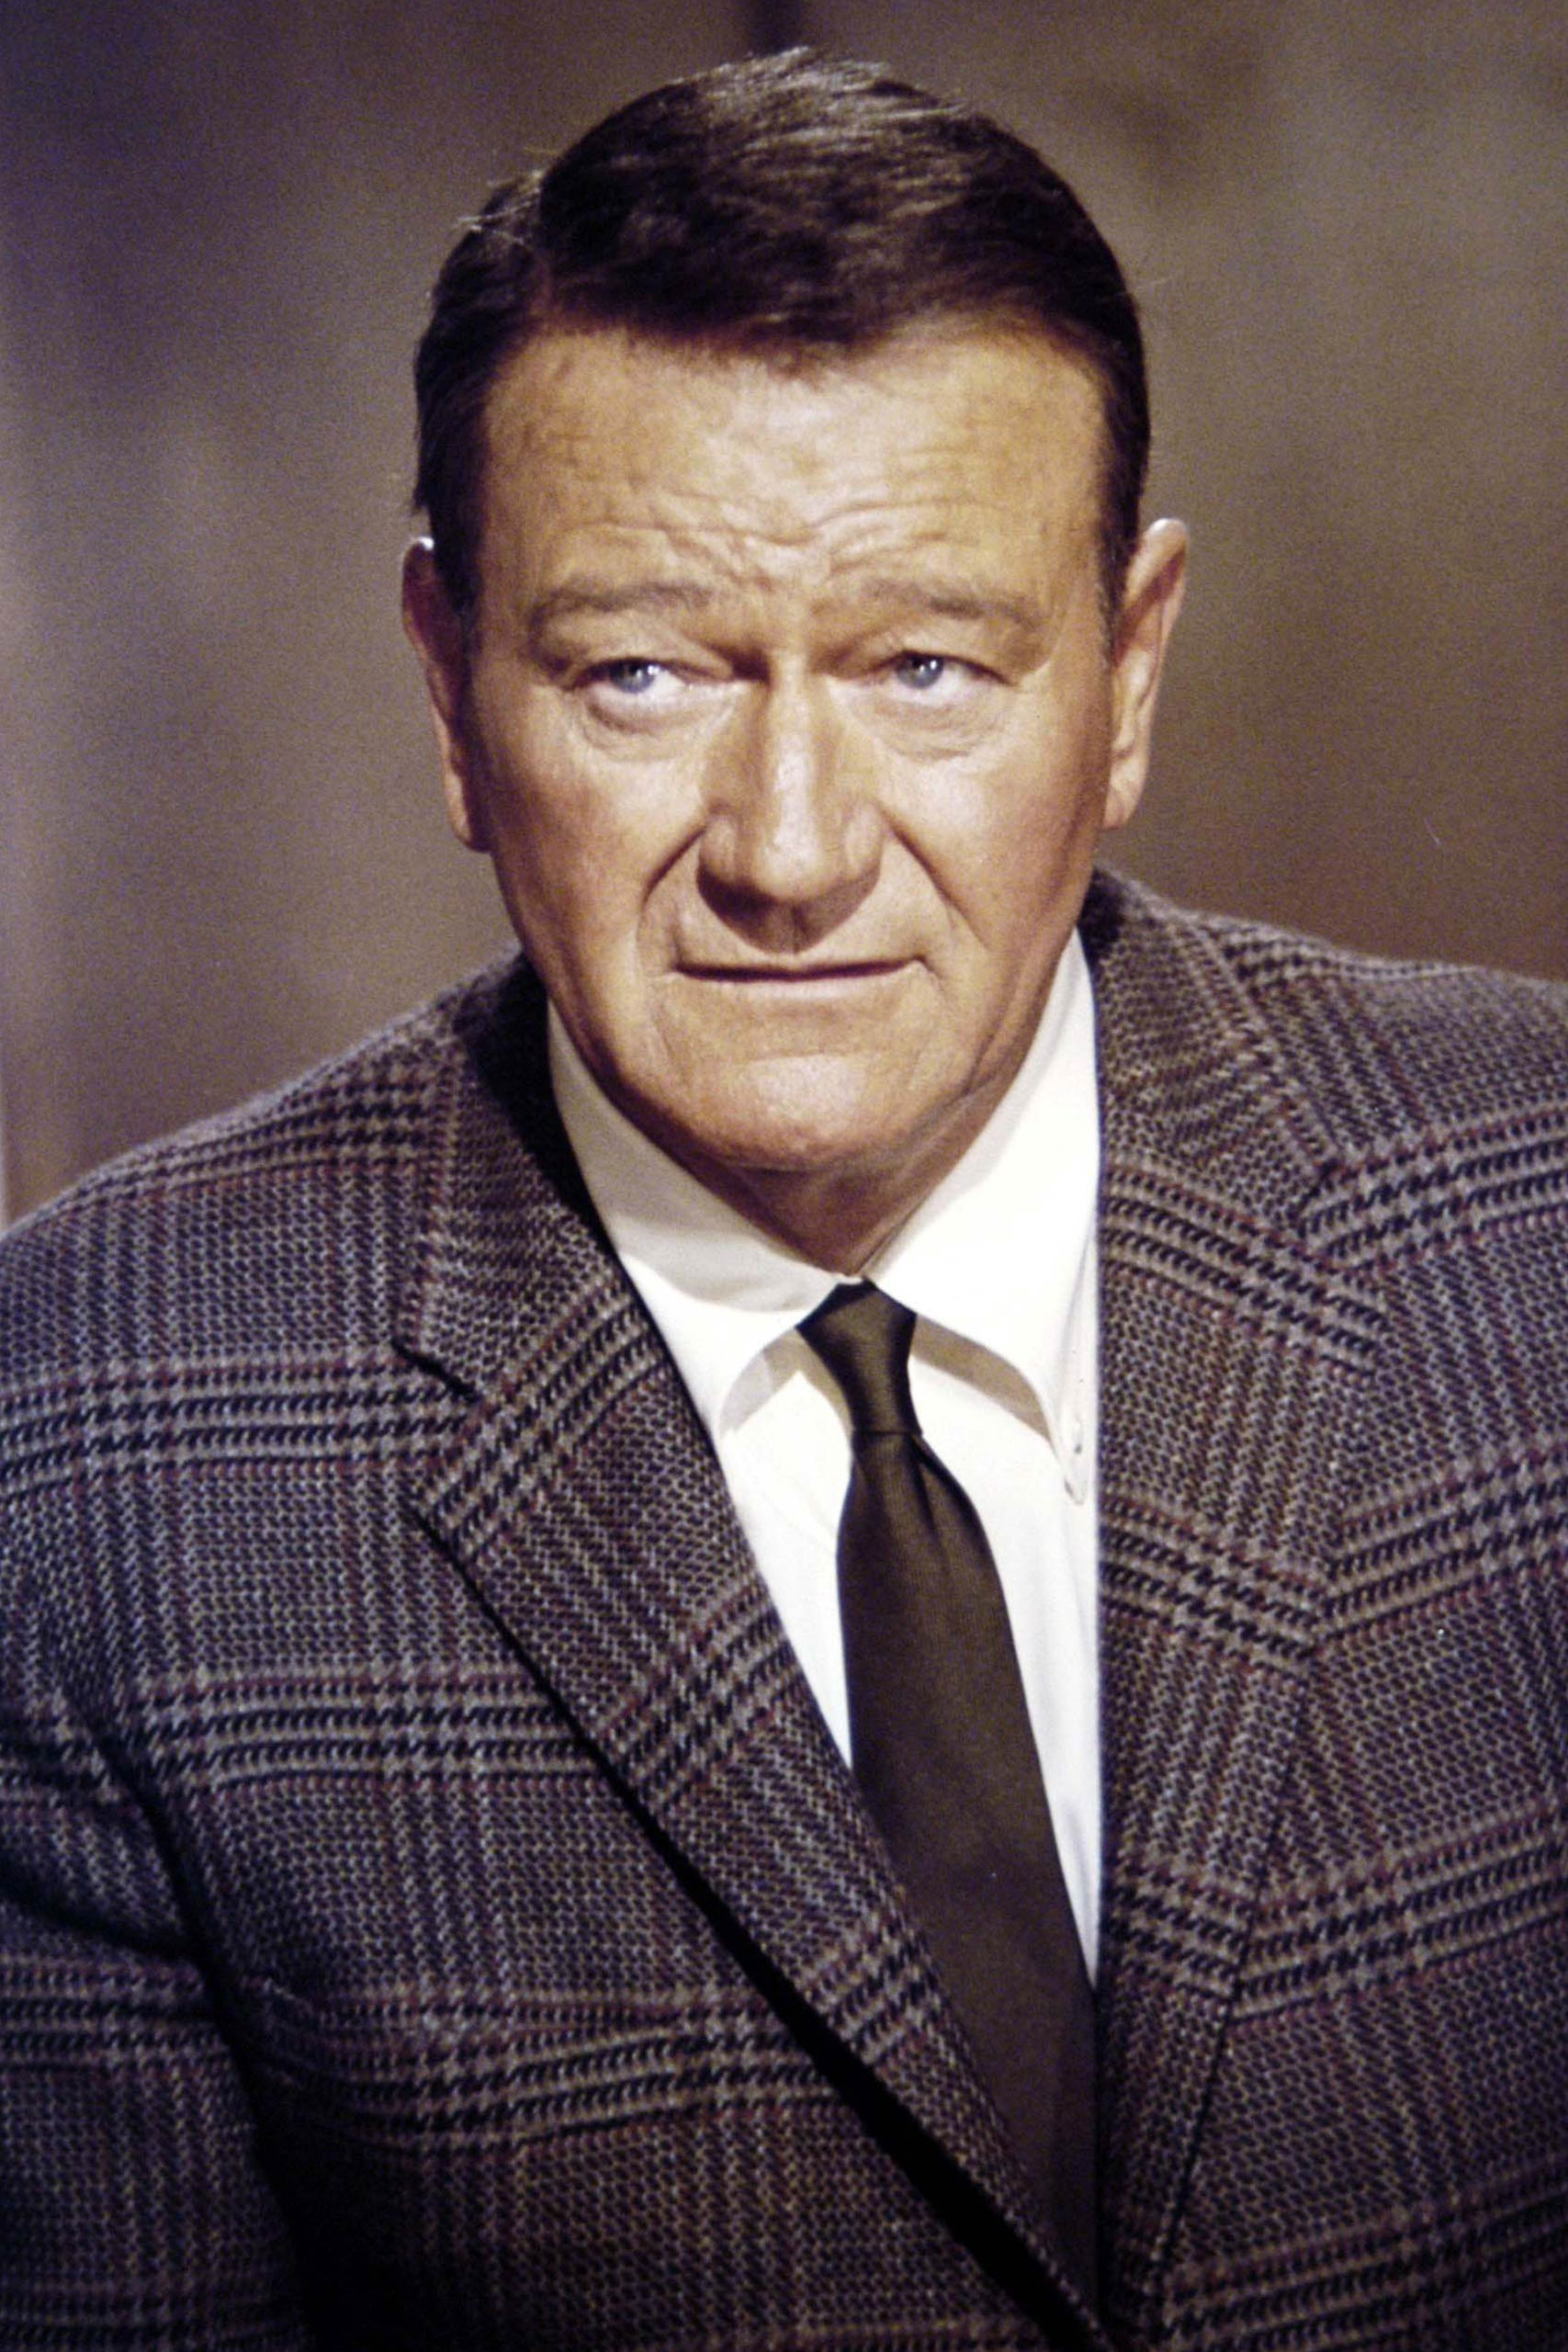 <strong>1970: John Wayne - <i>True Grit</i></strong>